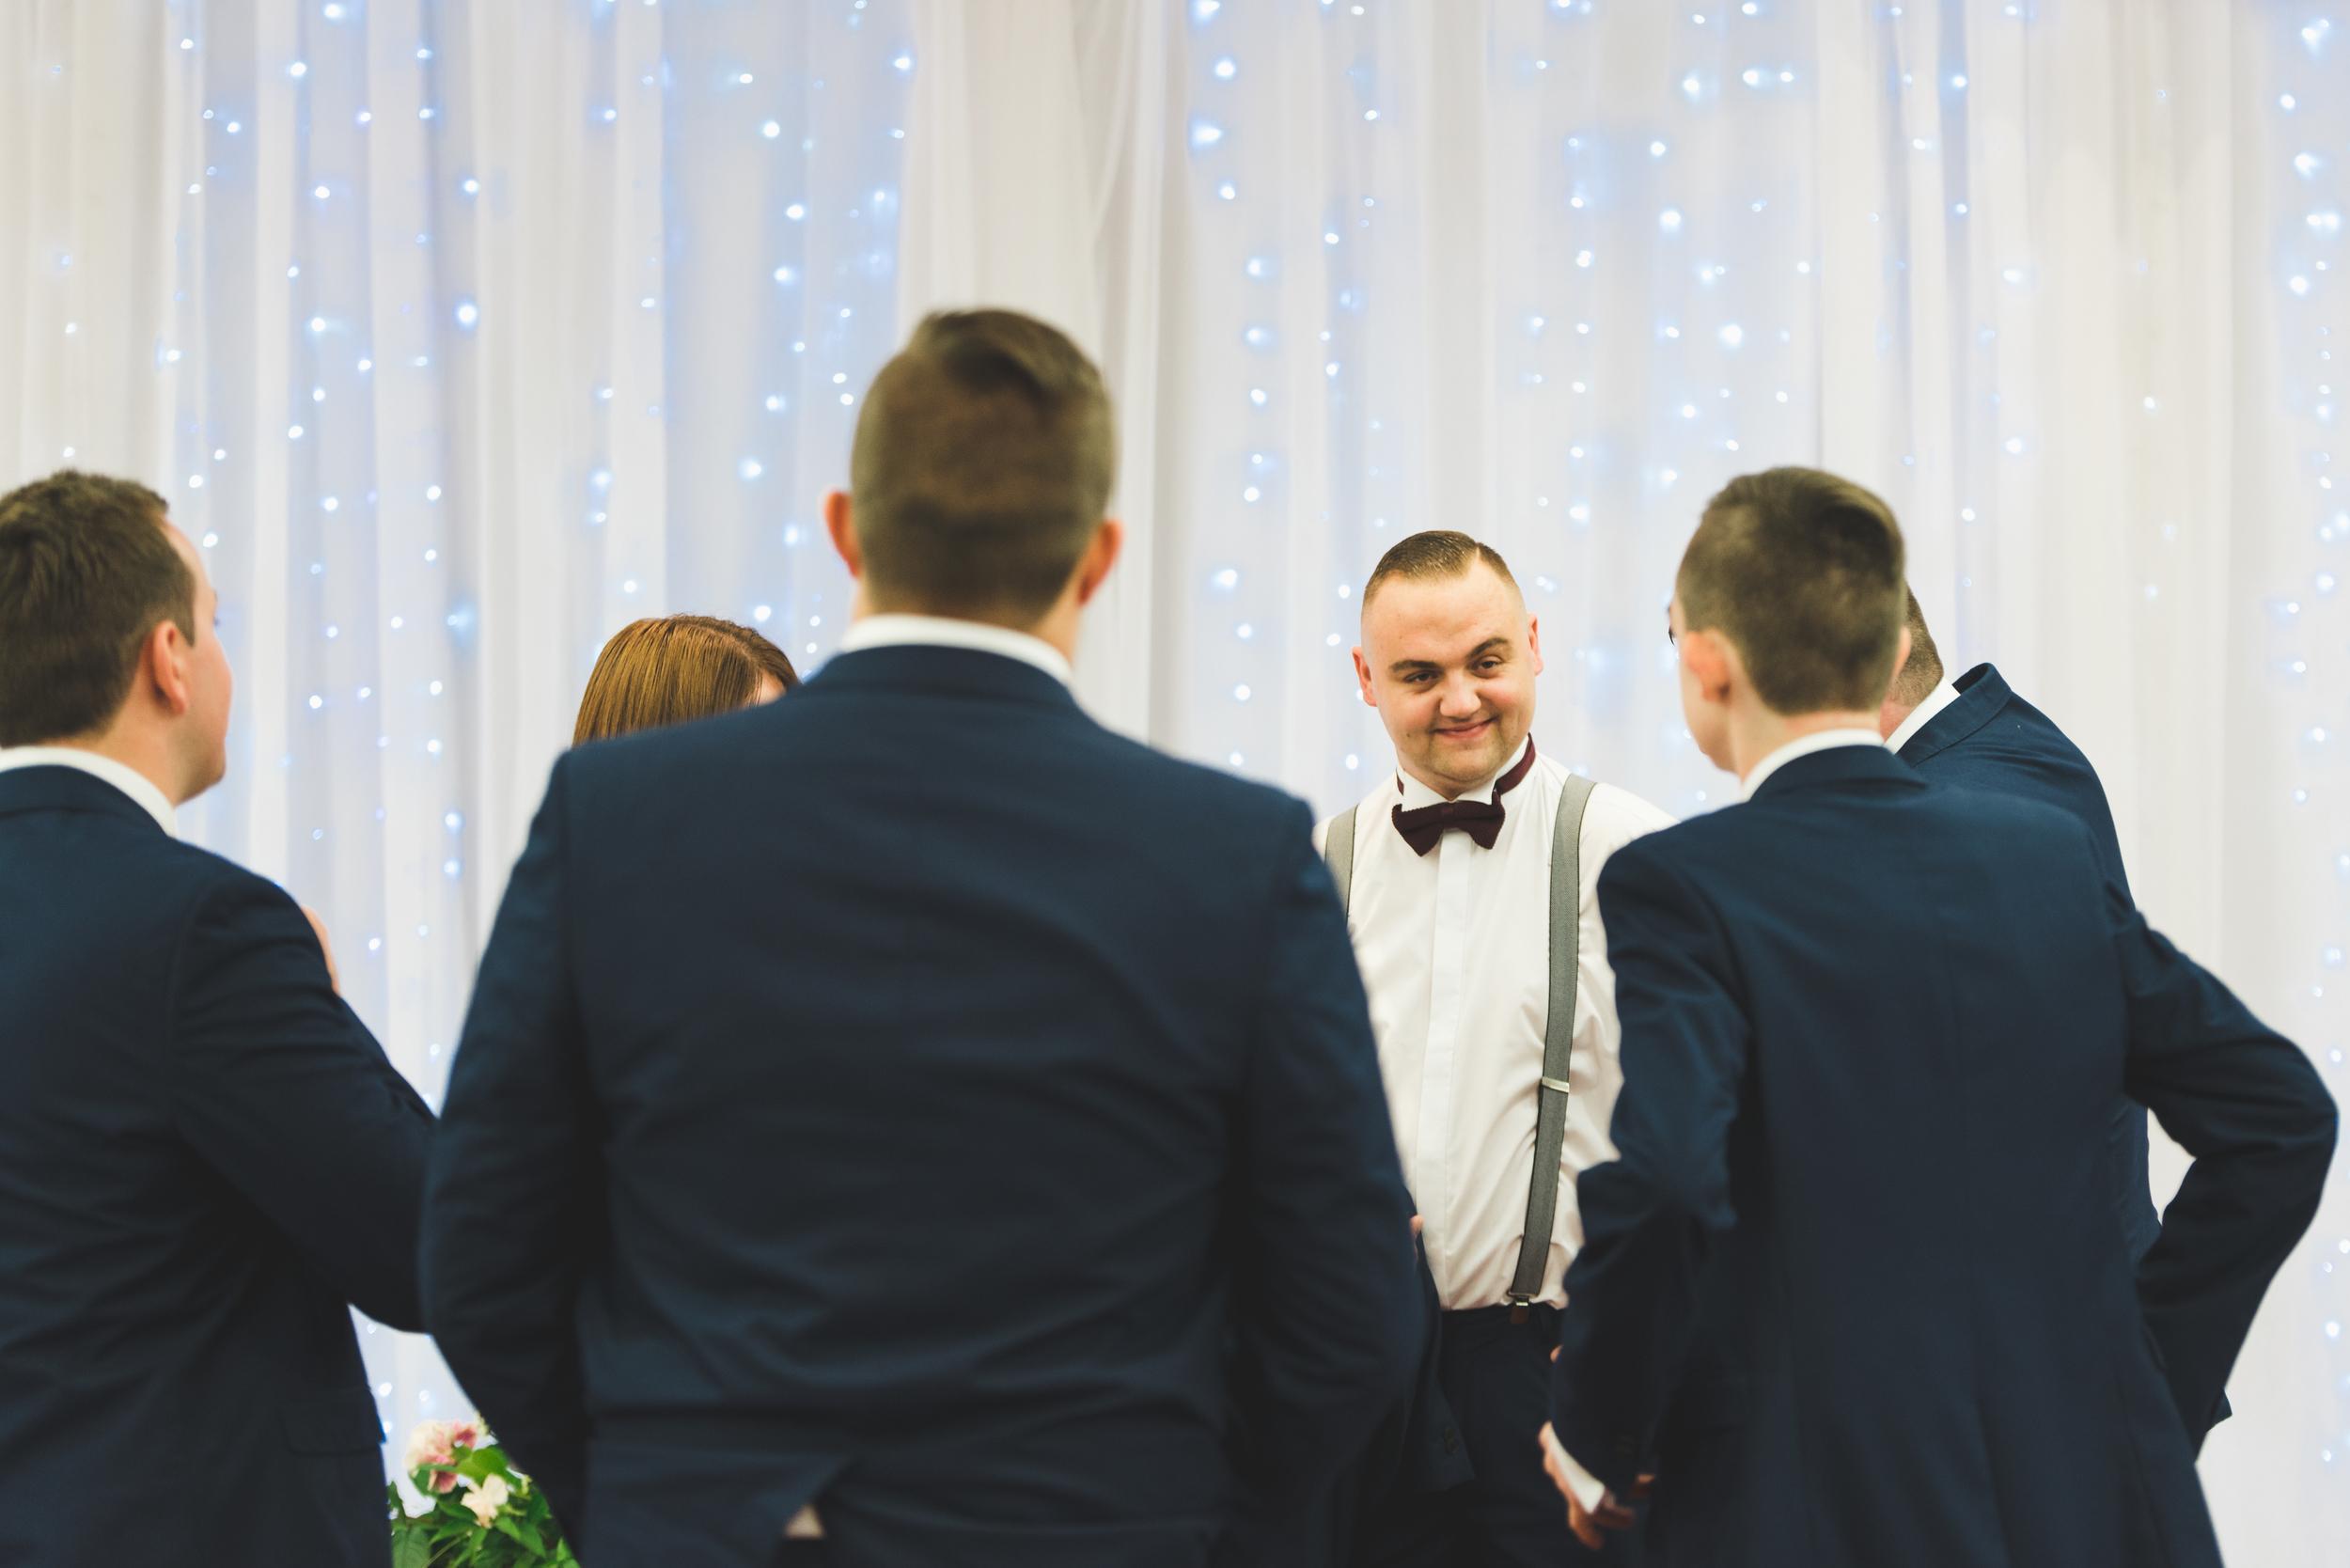 Northern_Ireland_Wedding_Photographer_Purephotoni_Dunsilly_Hotel_Groom_Ready